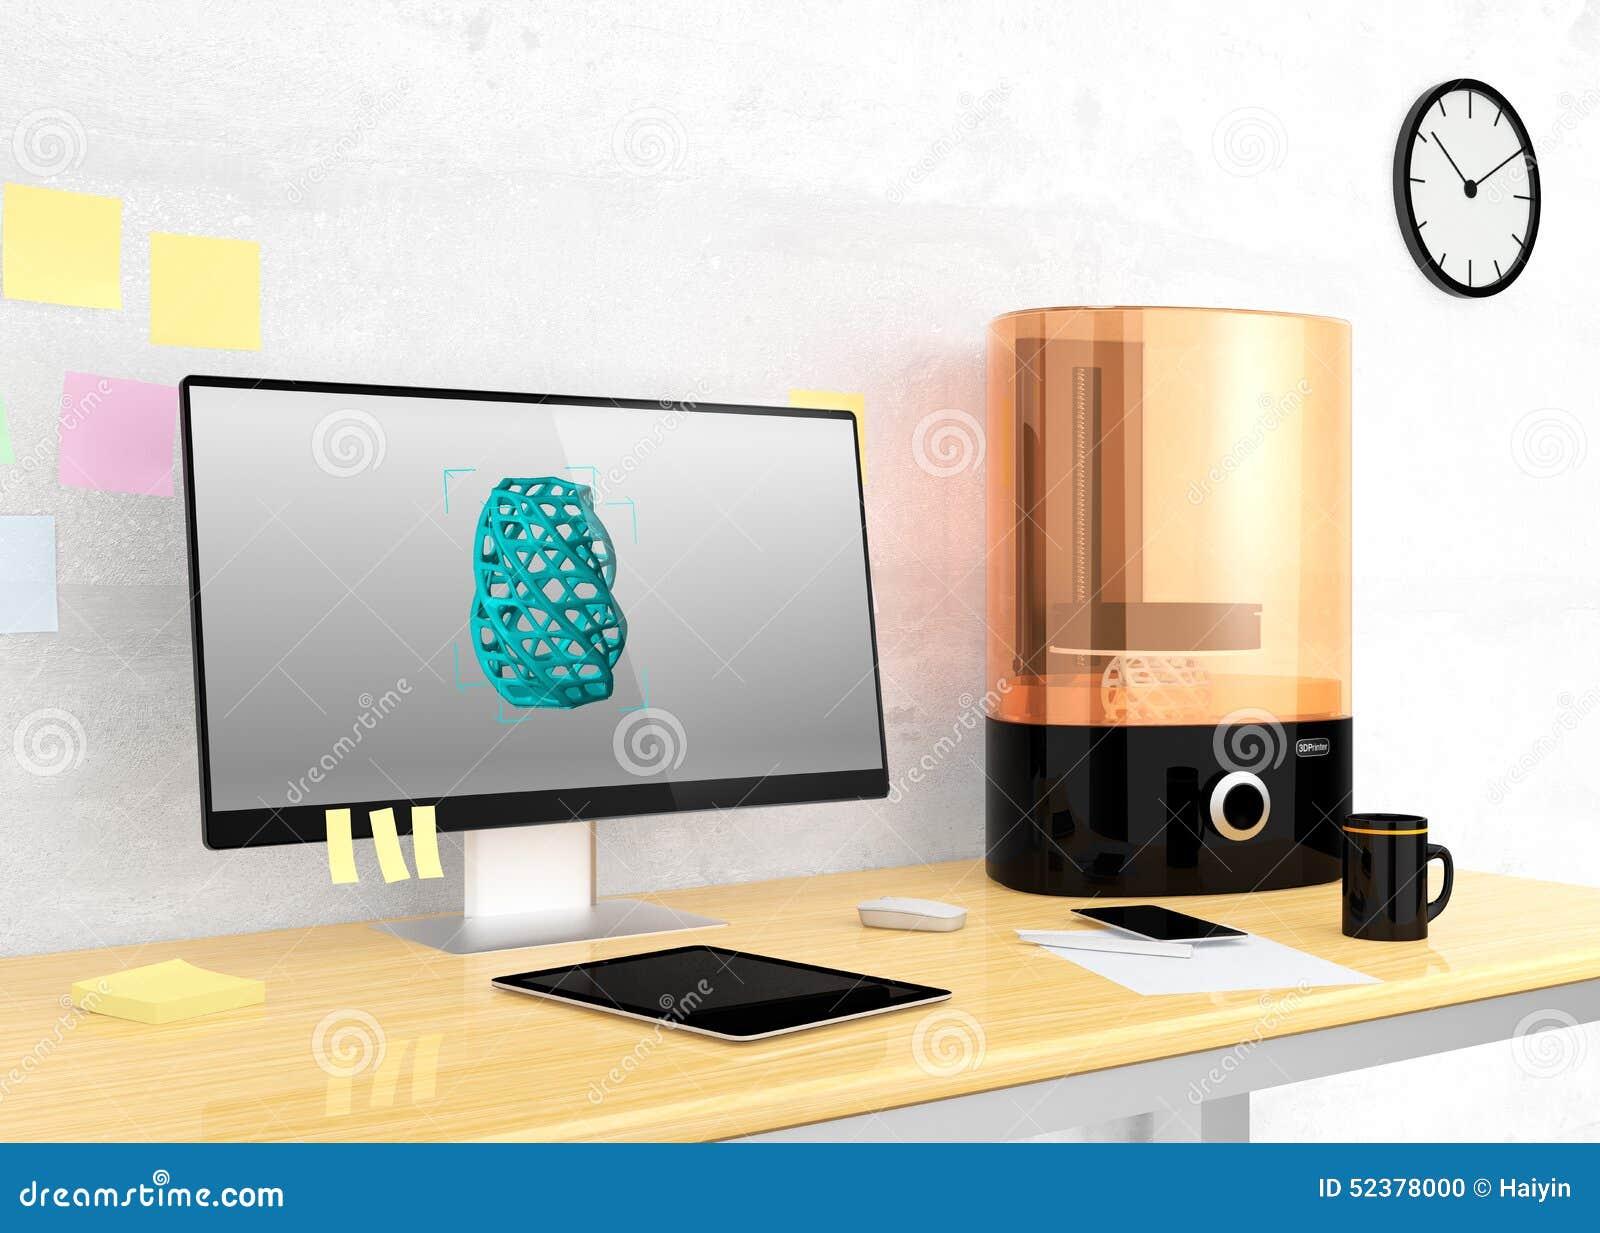 sla 3d打印机和台式计算机在桌上.图片